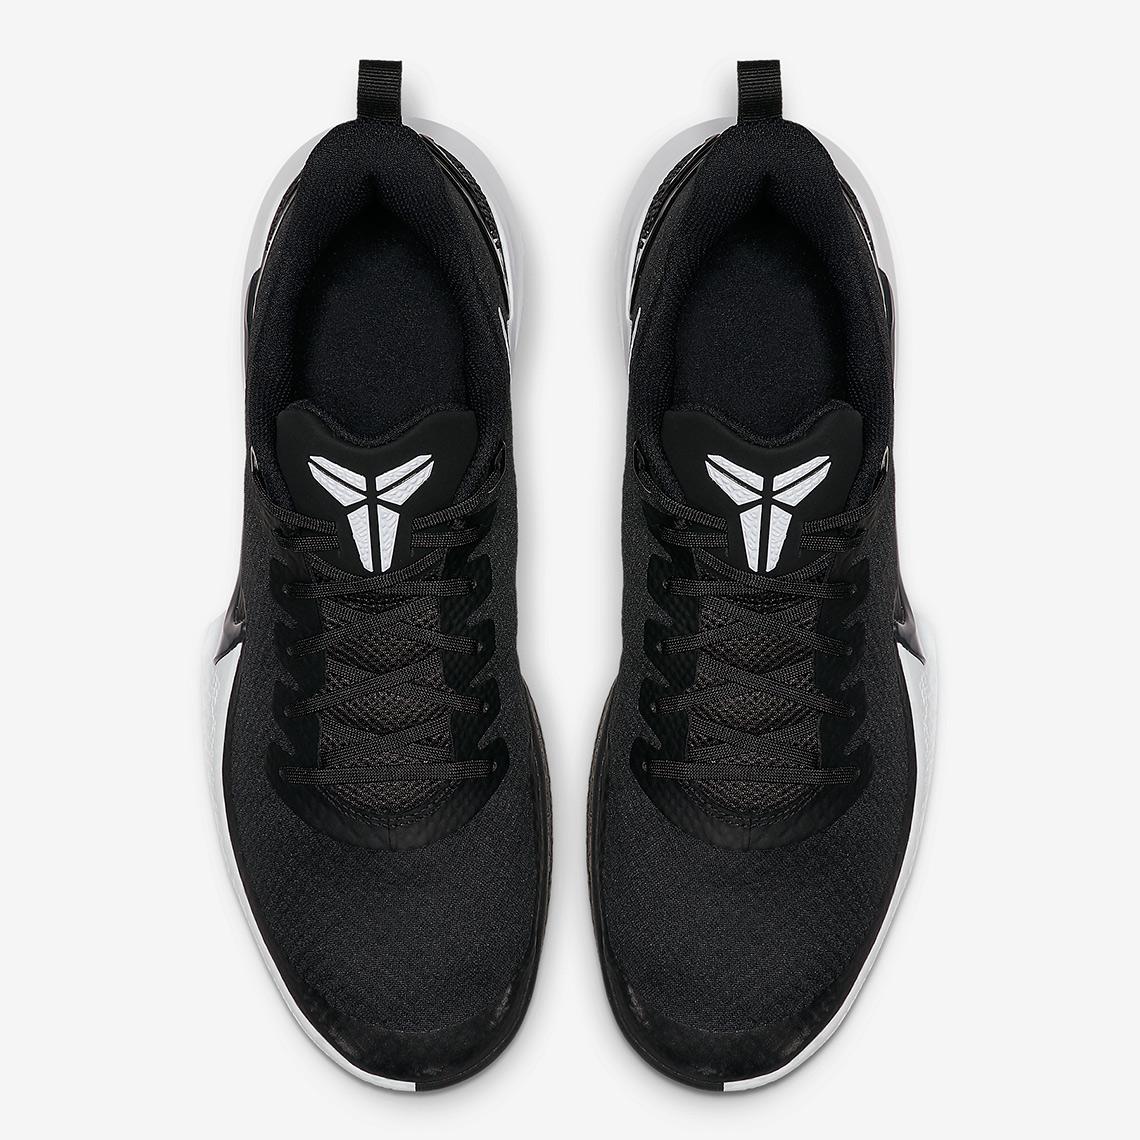 Kobe Bryant Light Shoes